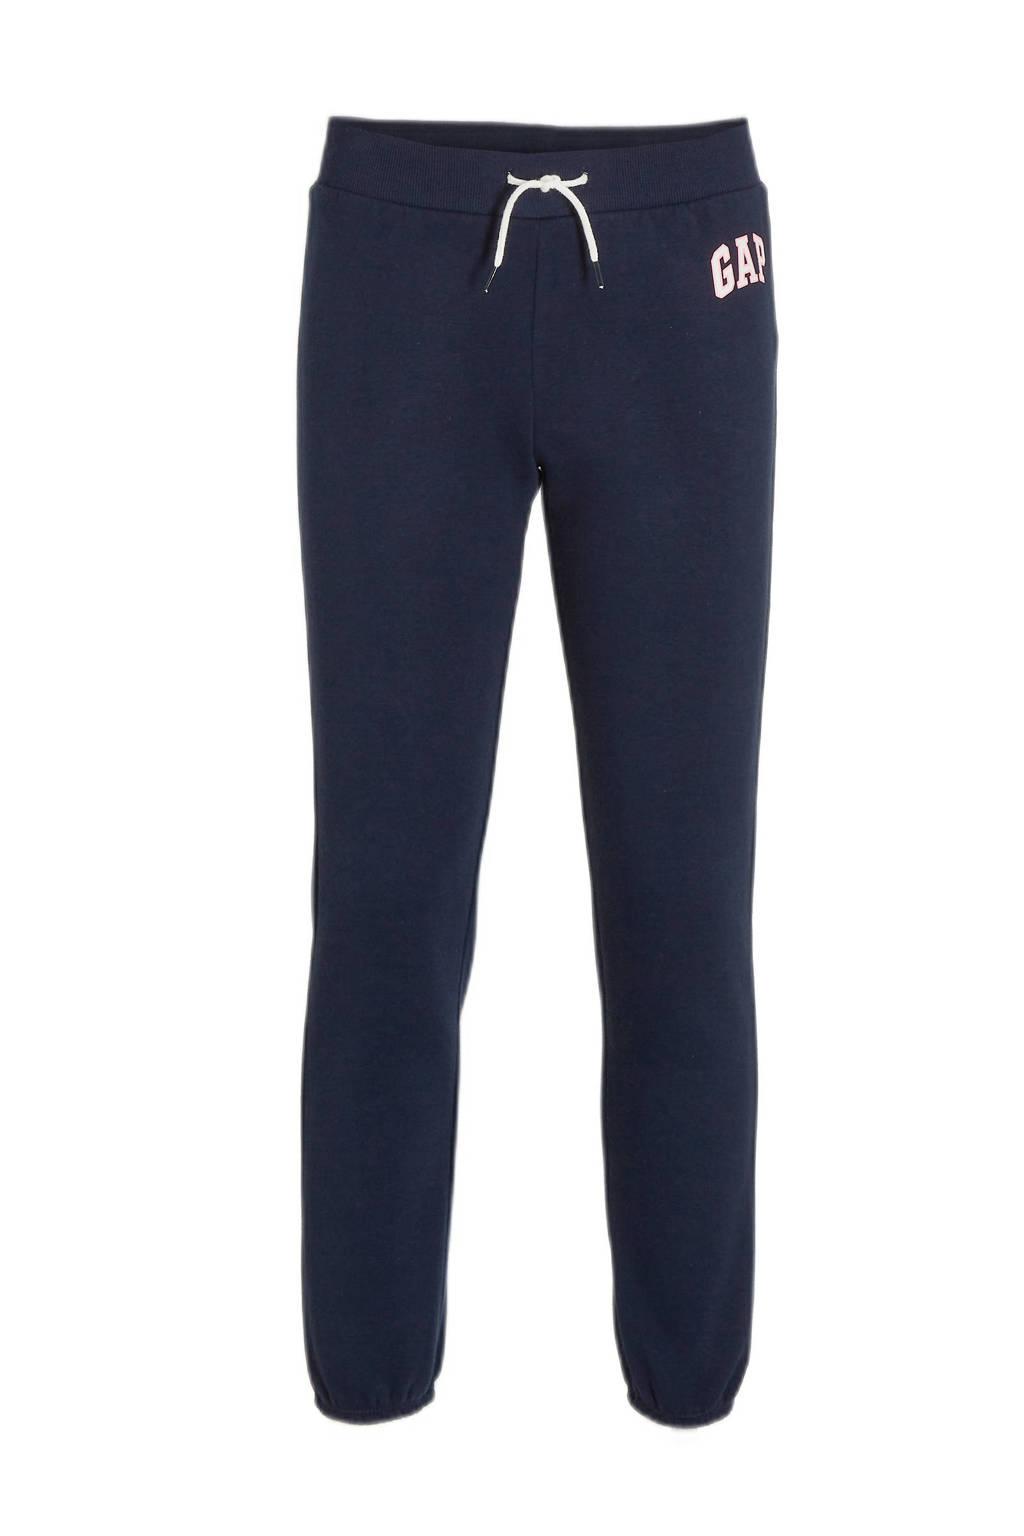 GAP slim fit joggingbroek met logo donkerblauw, Donkerblauw